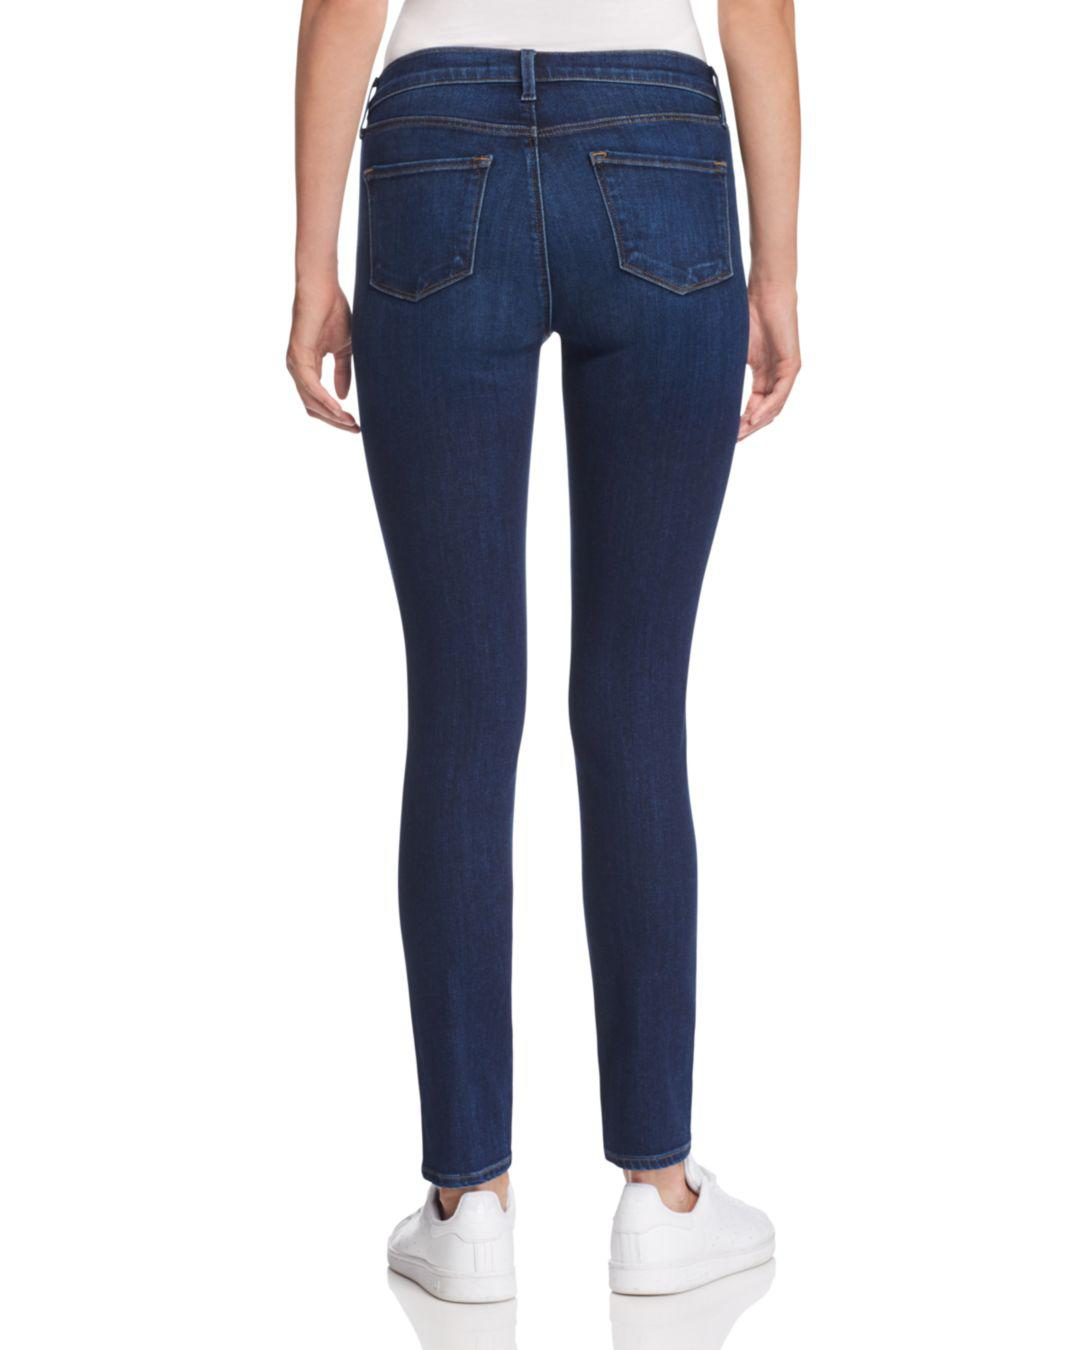 8ff8fe6849ce8 J Brand Mama J Skinny Maternity Jeans In Fleeting in Blue - Lyst